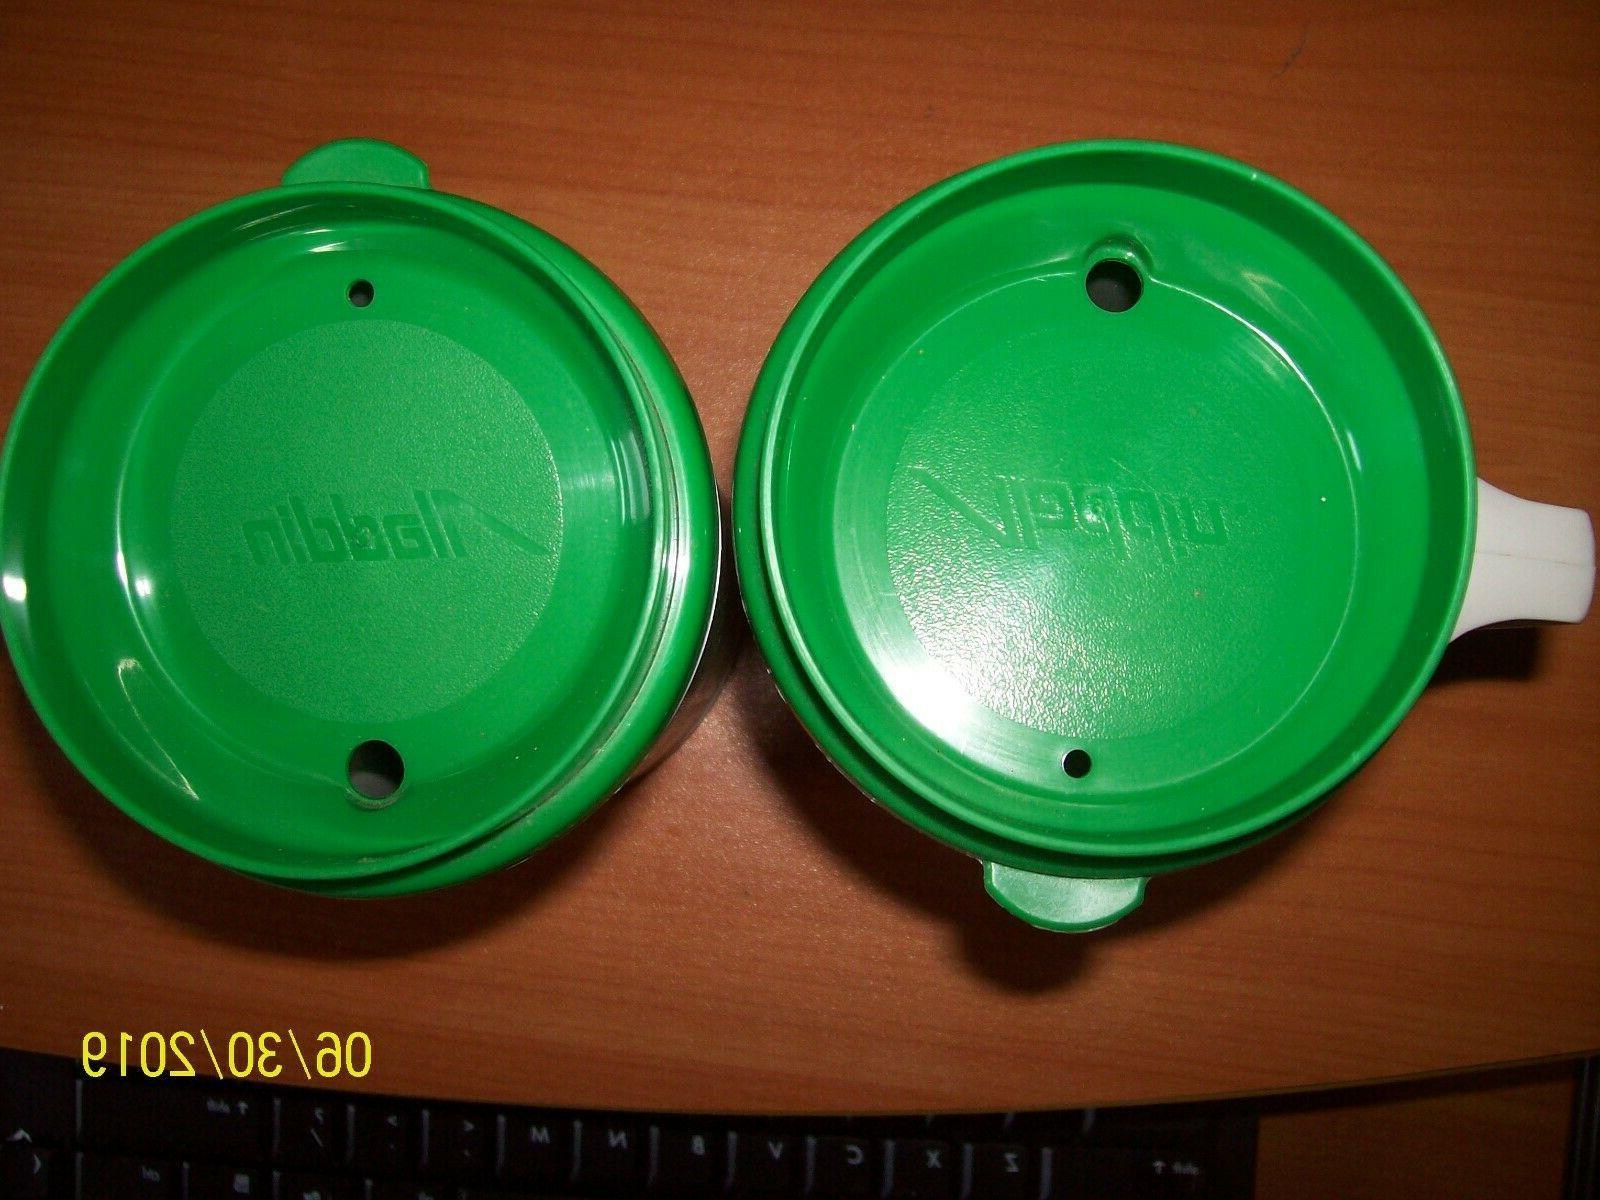 2 Vtg Insulated Travel 12 Oz Aladdin Coffe mug